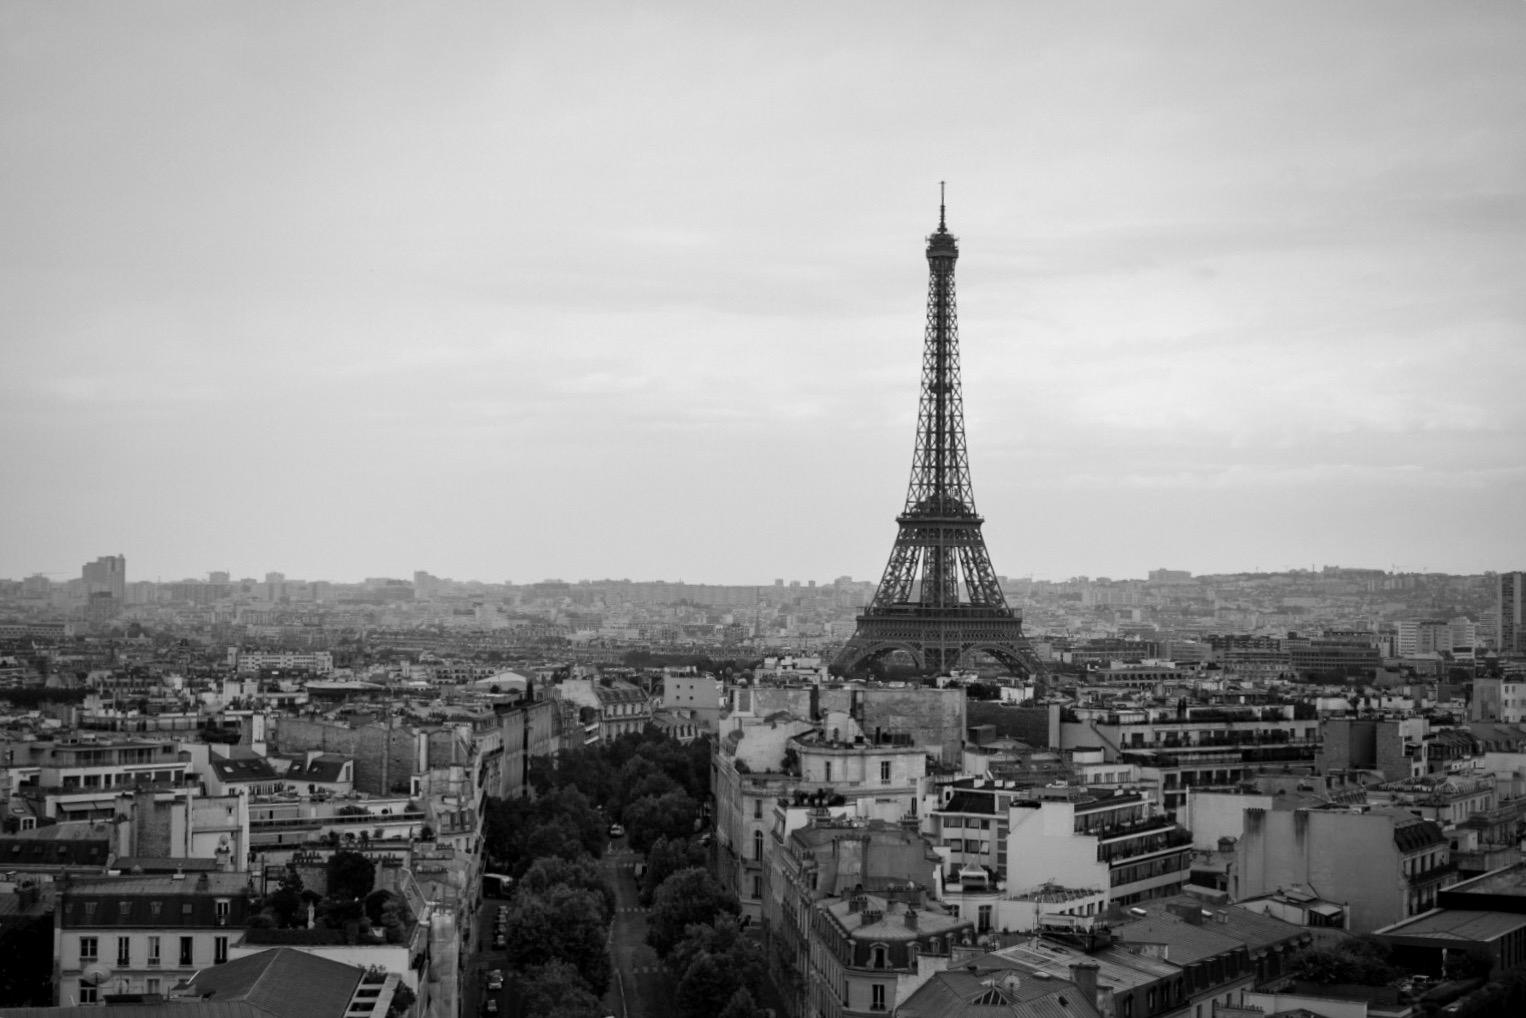 Paris looks even more beautiful in monochrome.